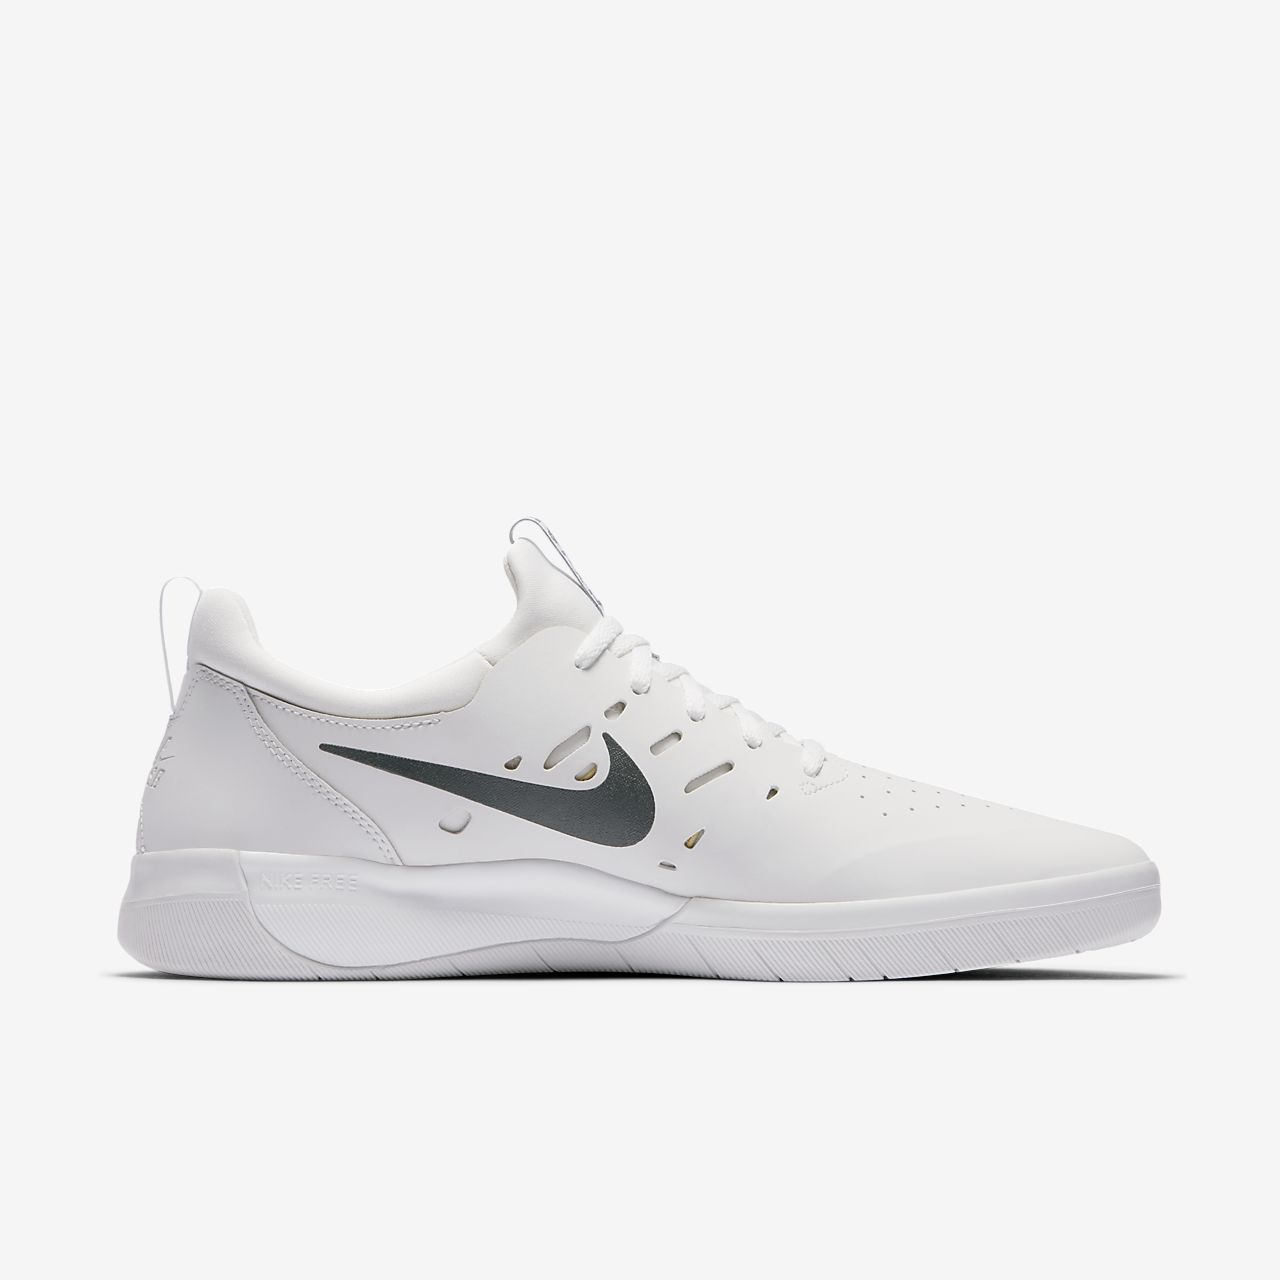 74c9d3ca7c962 Nike SB Nyjah Free Skate Shoe. Nike.com IE